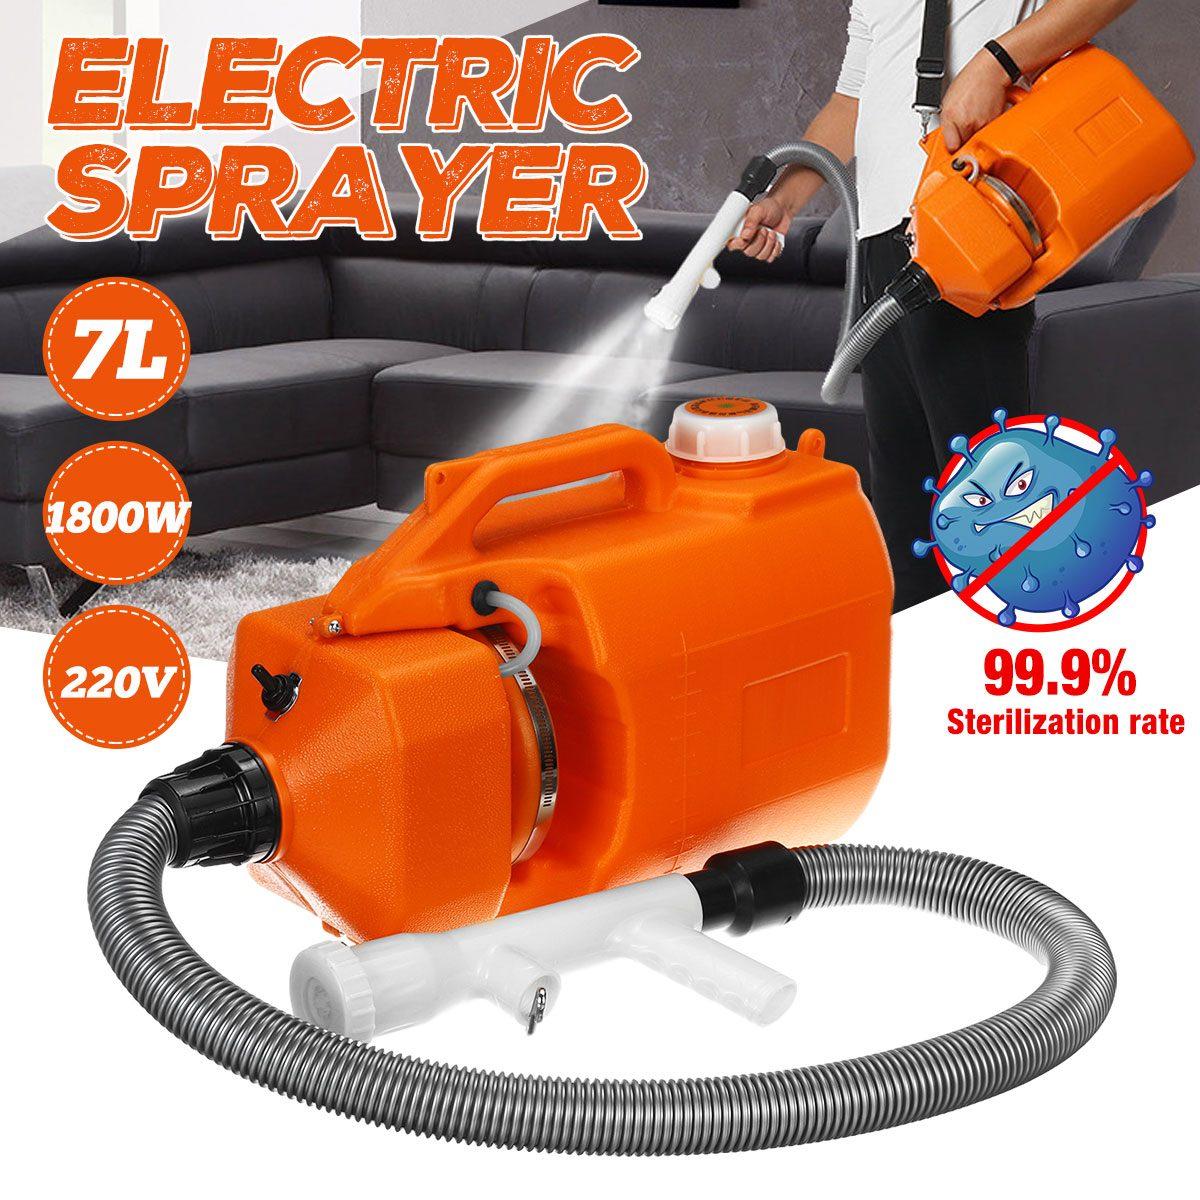 1800W 7L 220V Electric ULV Sprayer Fogger Machine Cold Mosquito Fogging Machine Ultra Low Capacity Fogger Disinfection Funnel